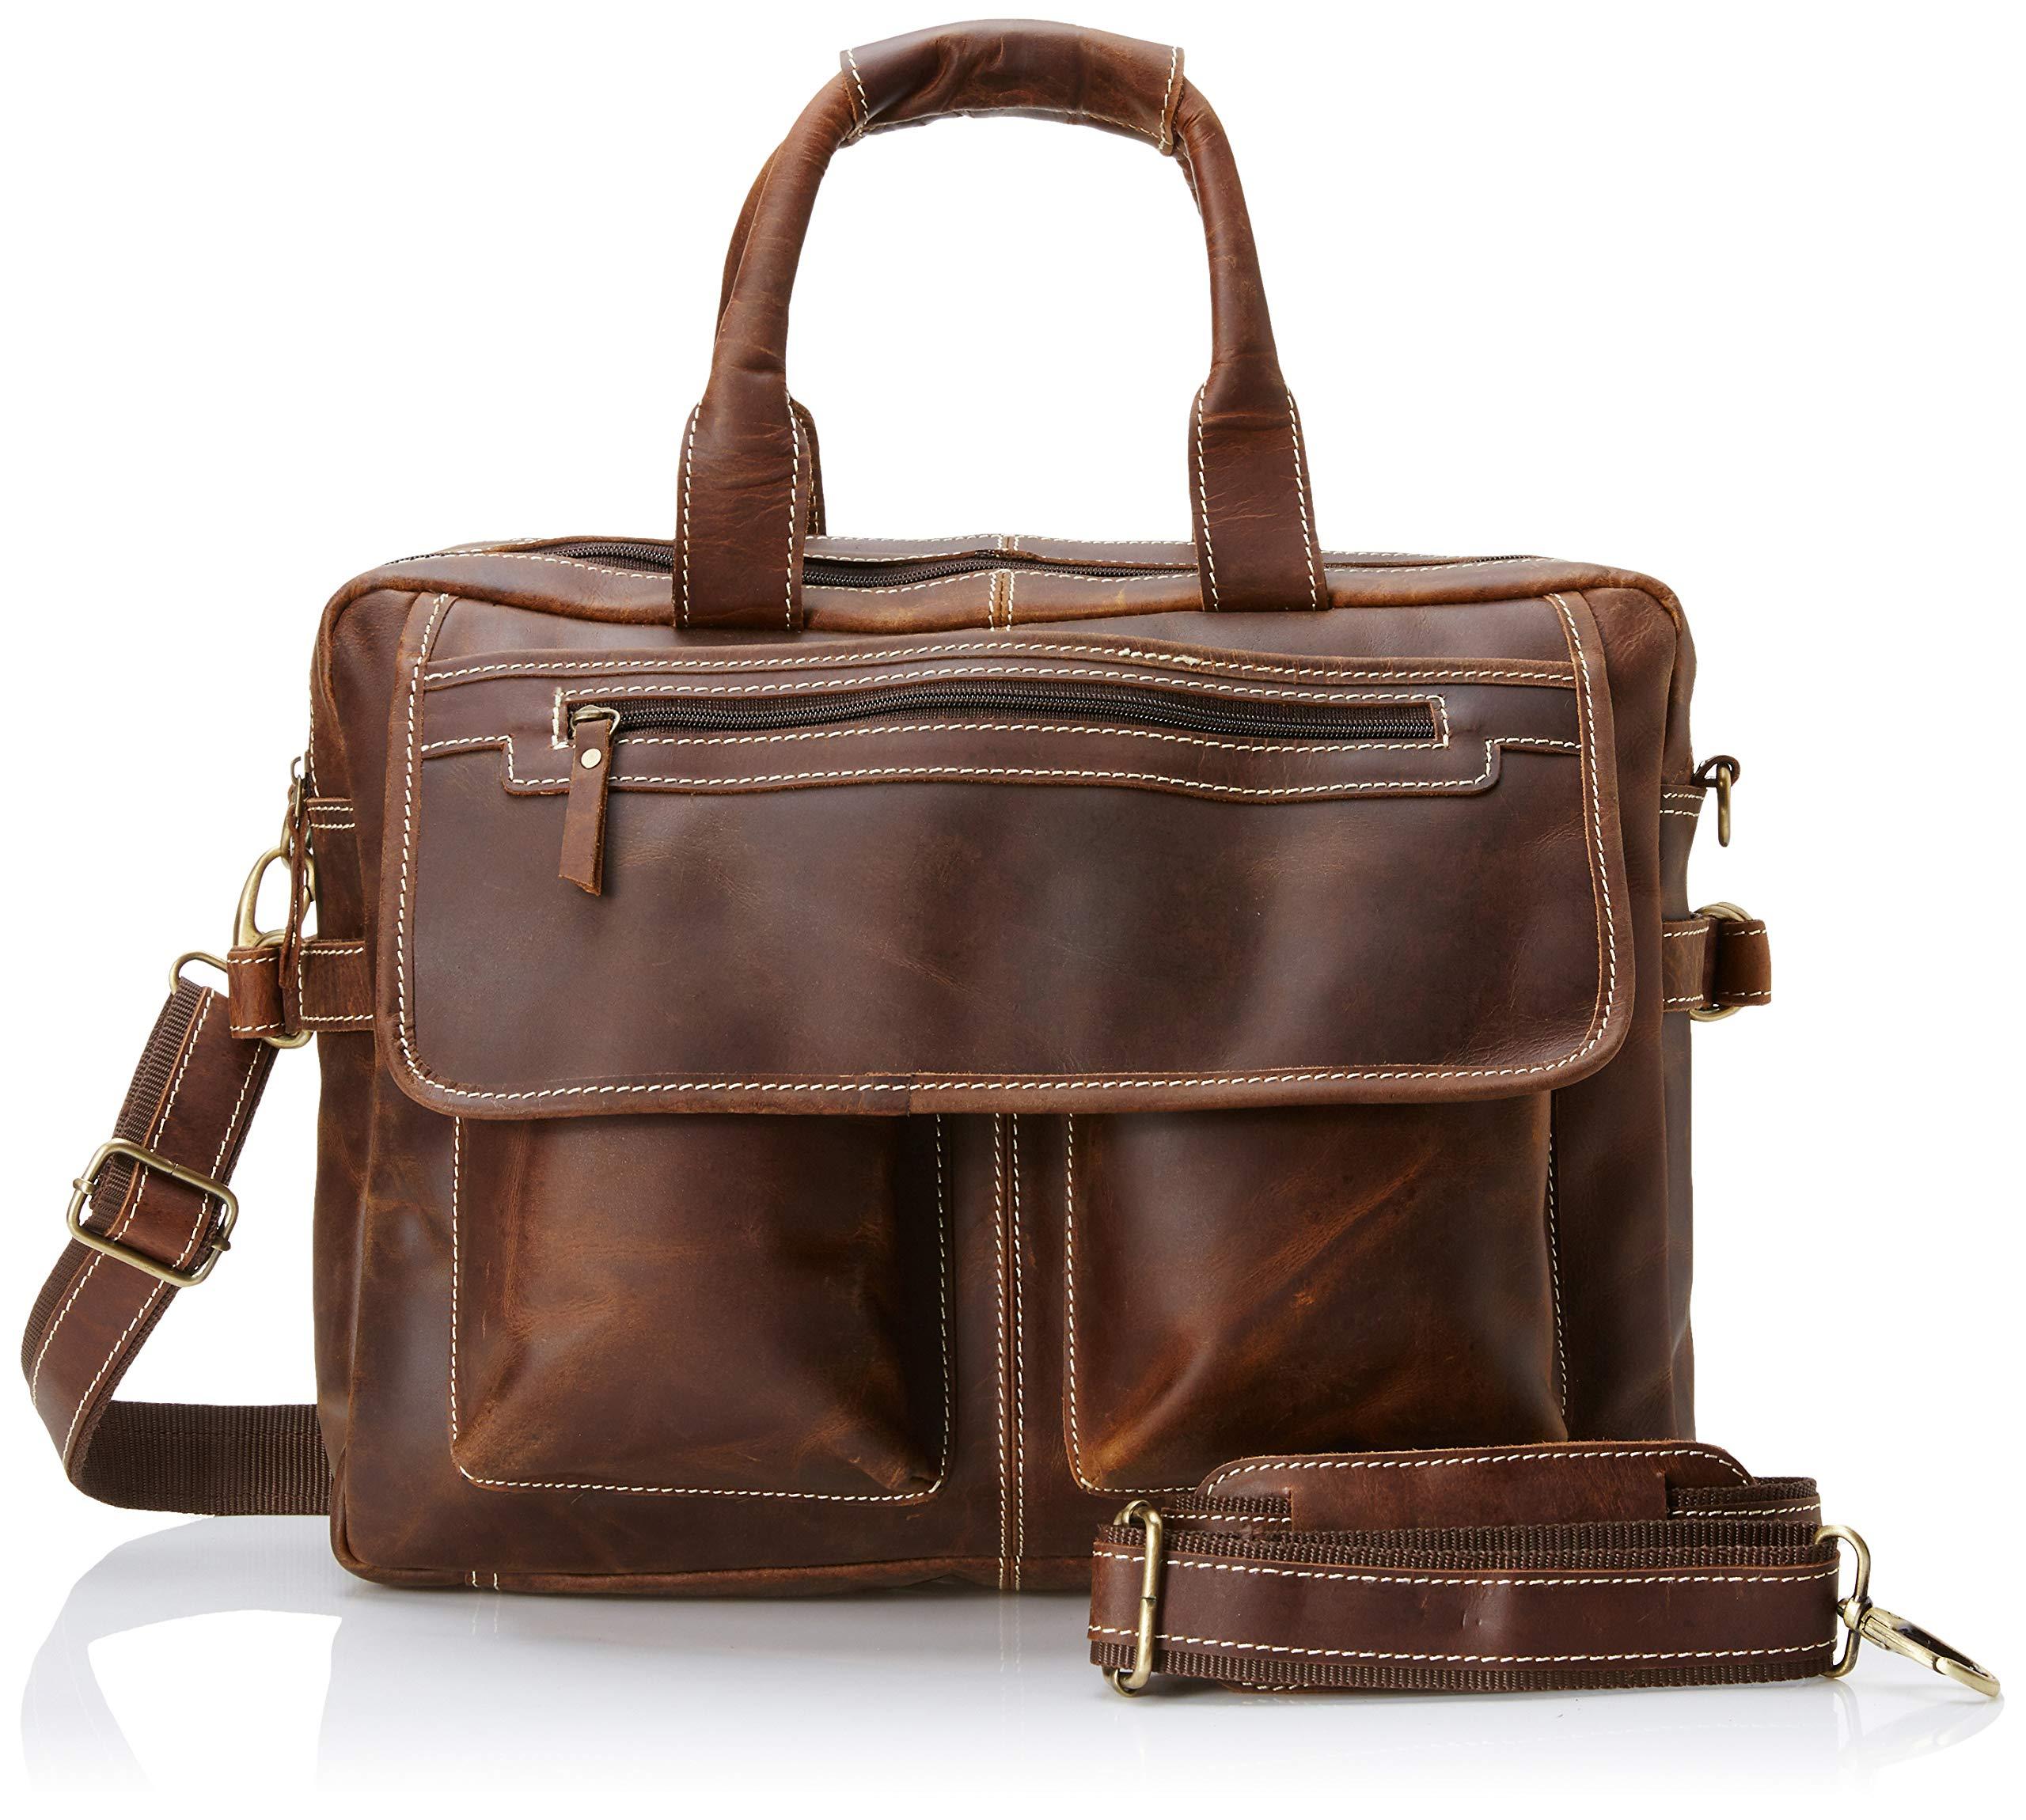 16 inch Vintage Buffalo Leather Messenger Satchel Laptop Briefcase Men's Bag Crazy Vintage Leather Messenger (Brown) by Ruzioon (Image #5)